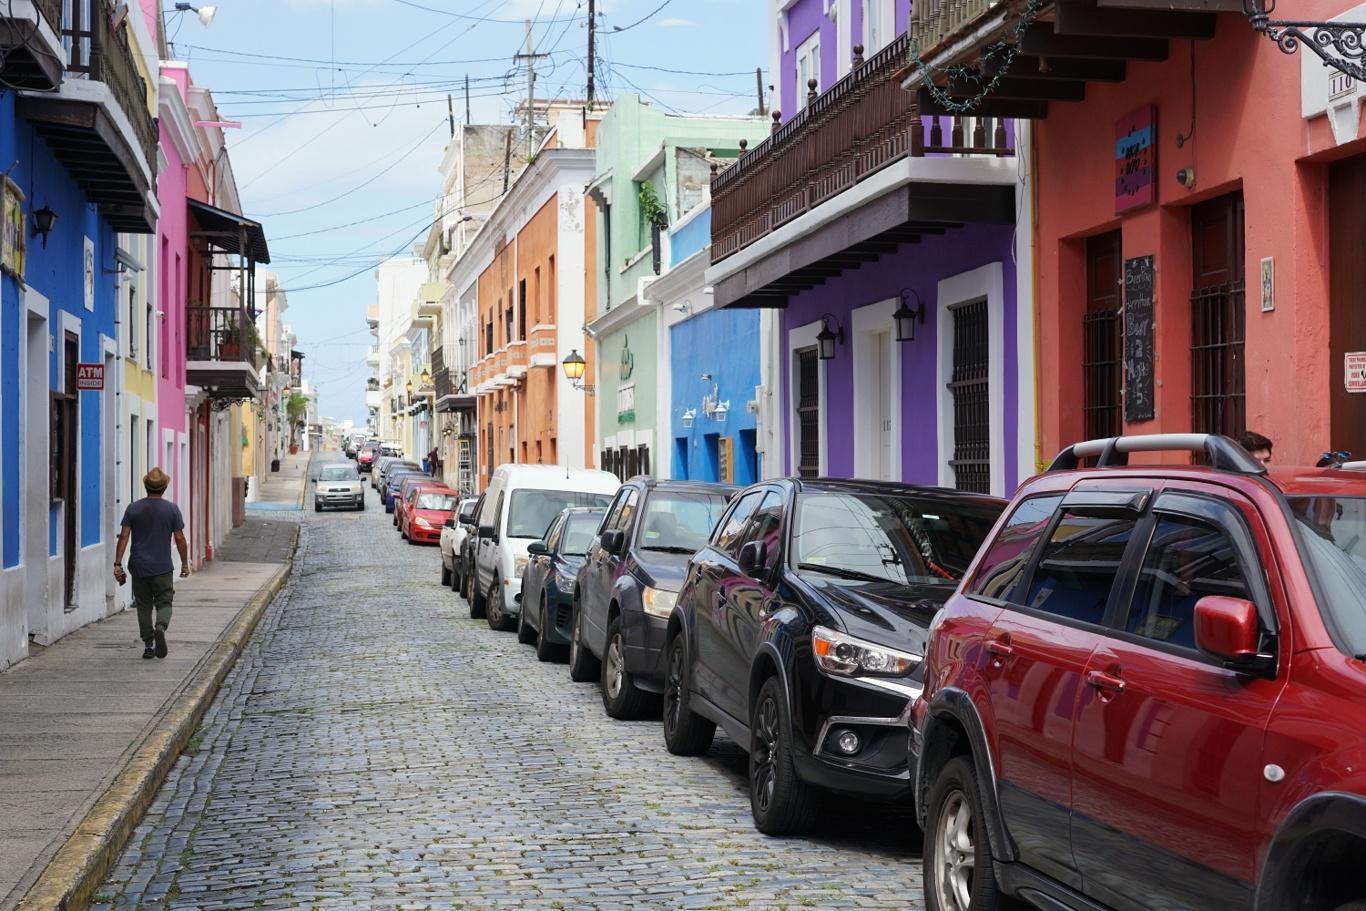 The cobblestone streets of Old San Juan